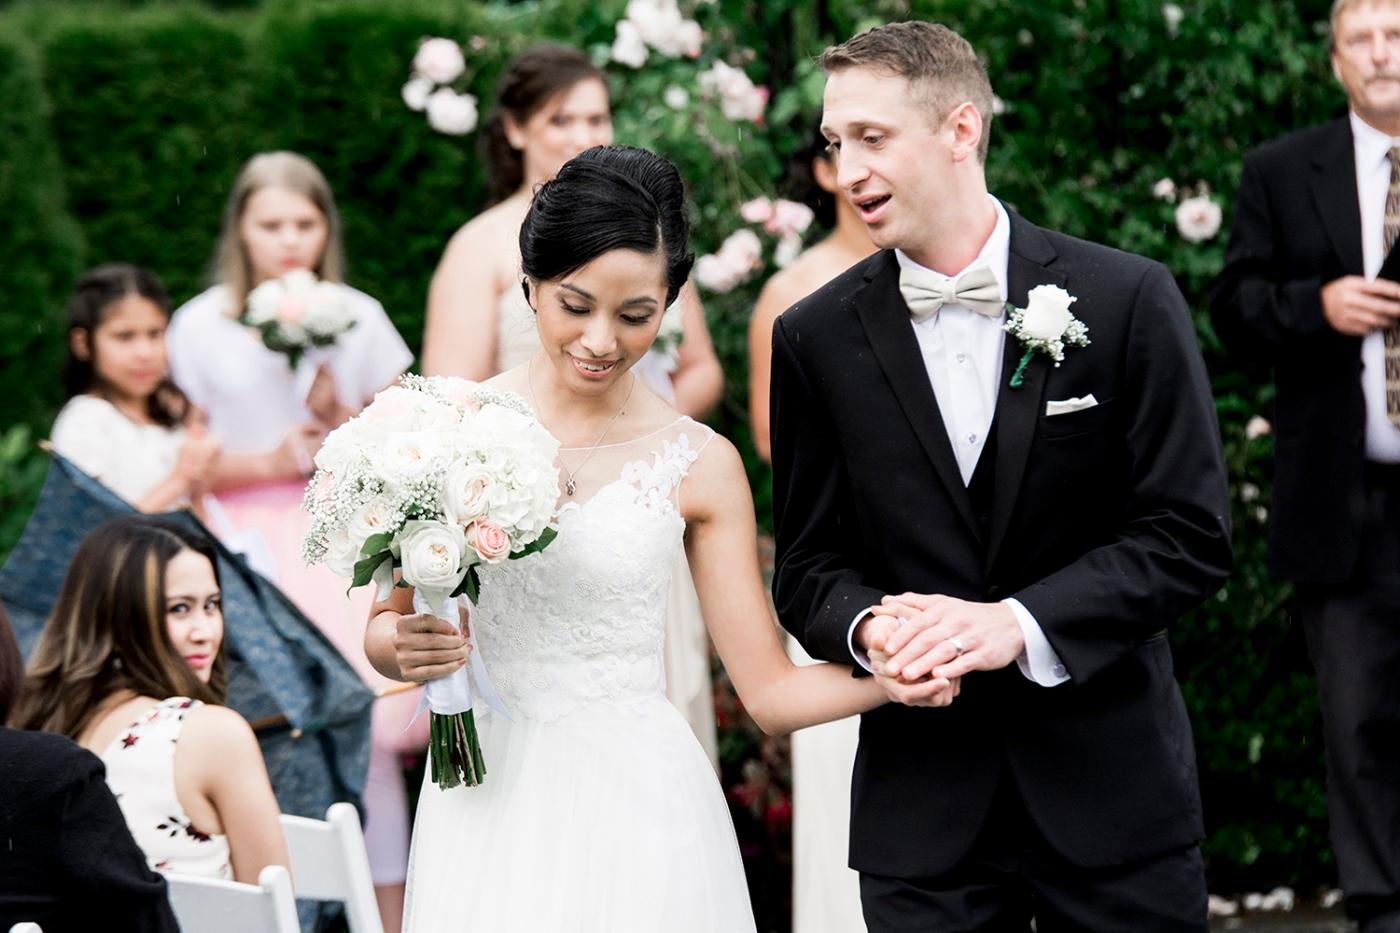 Jane_Speleers_2016_Details_Wedding_Wild_Rose_Estates_Venue_JS7_7813